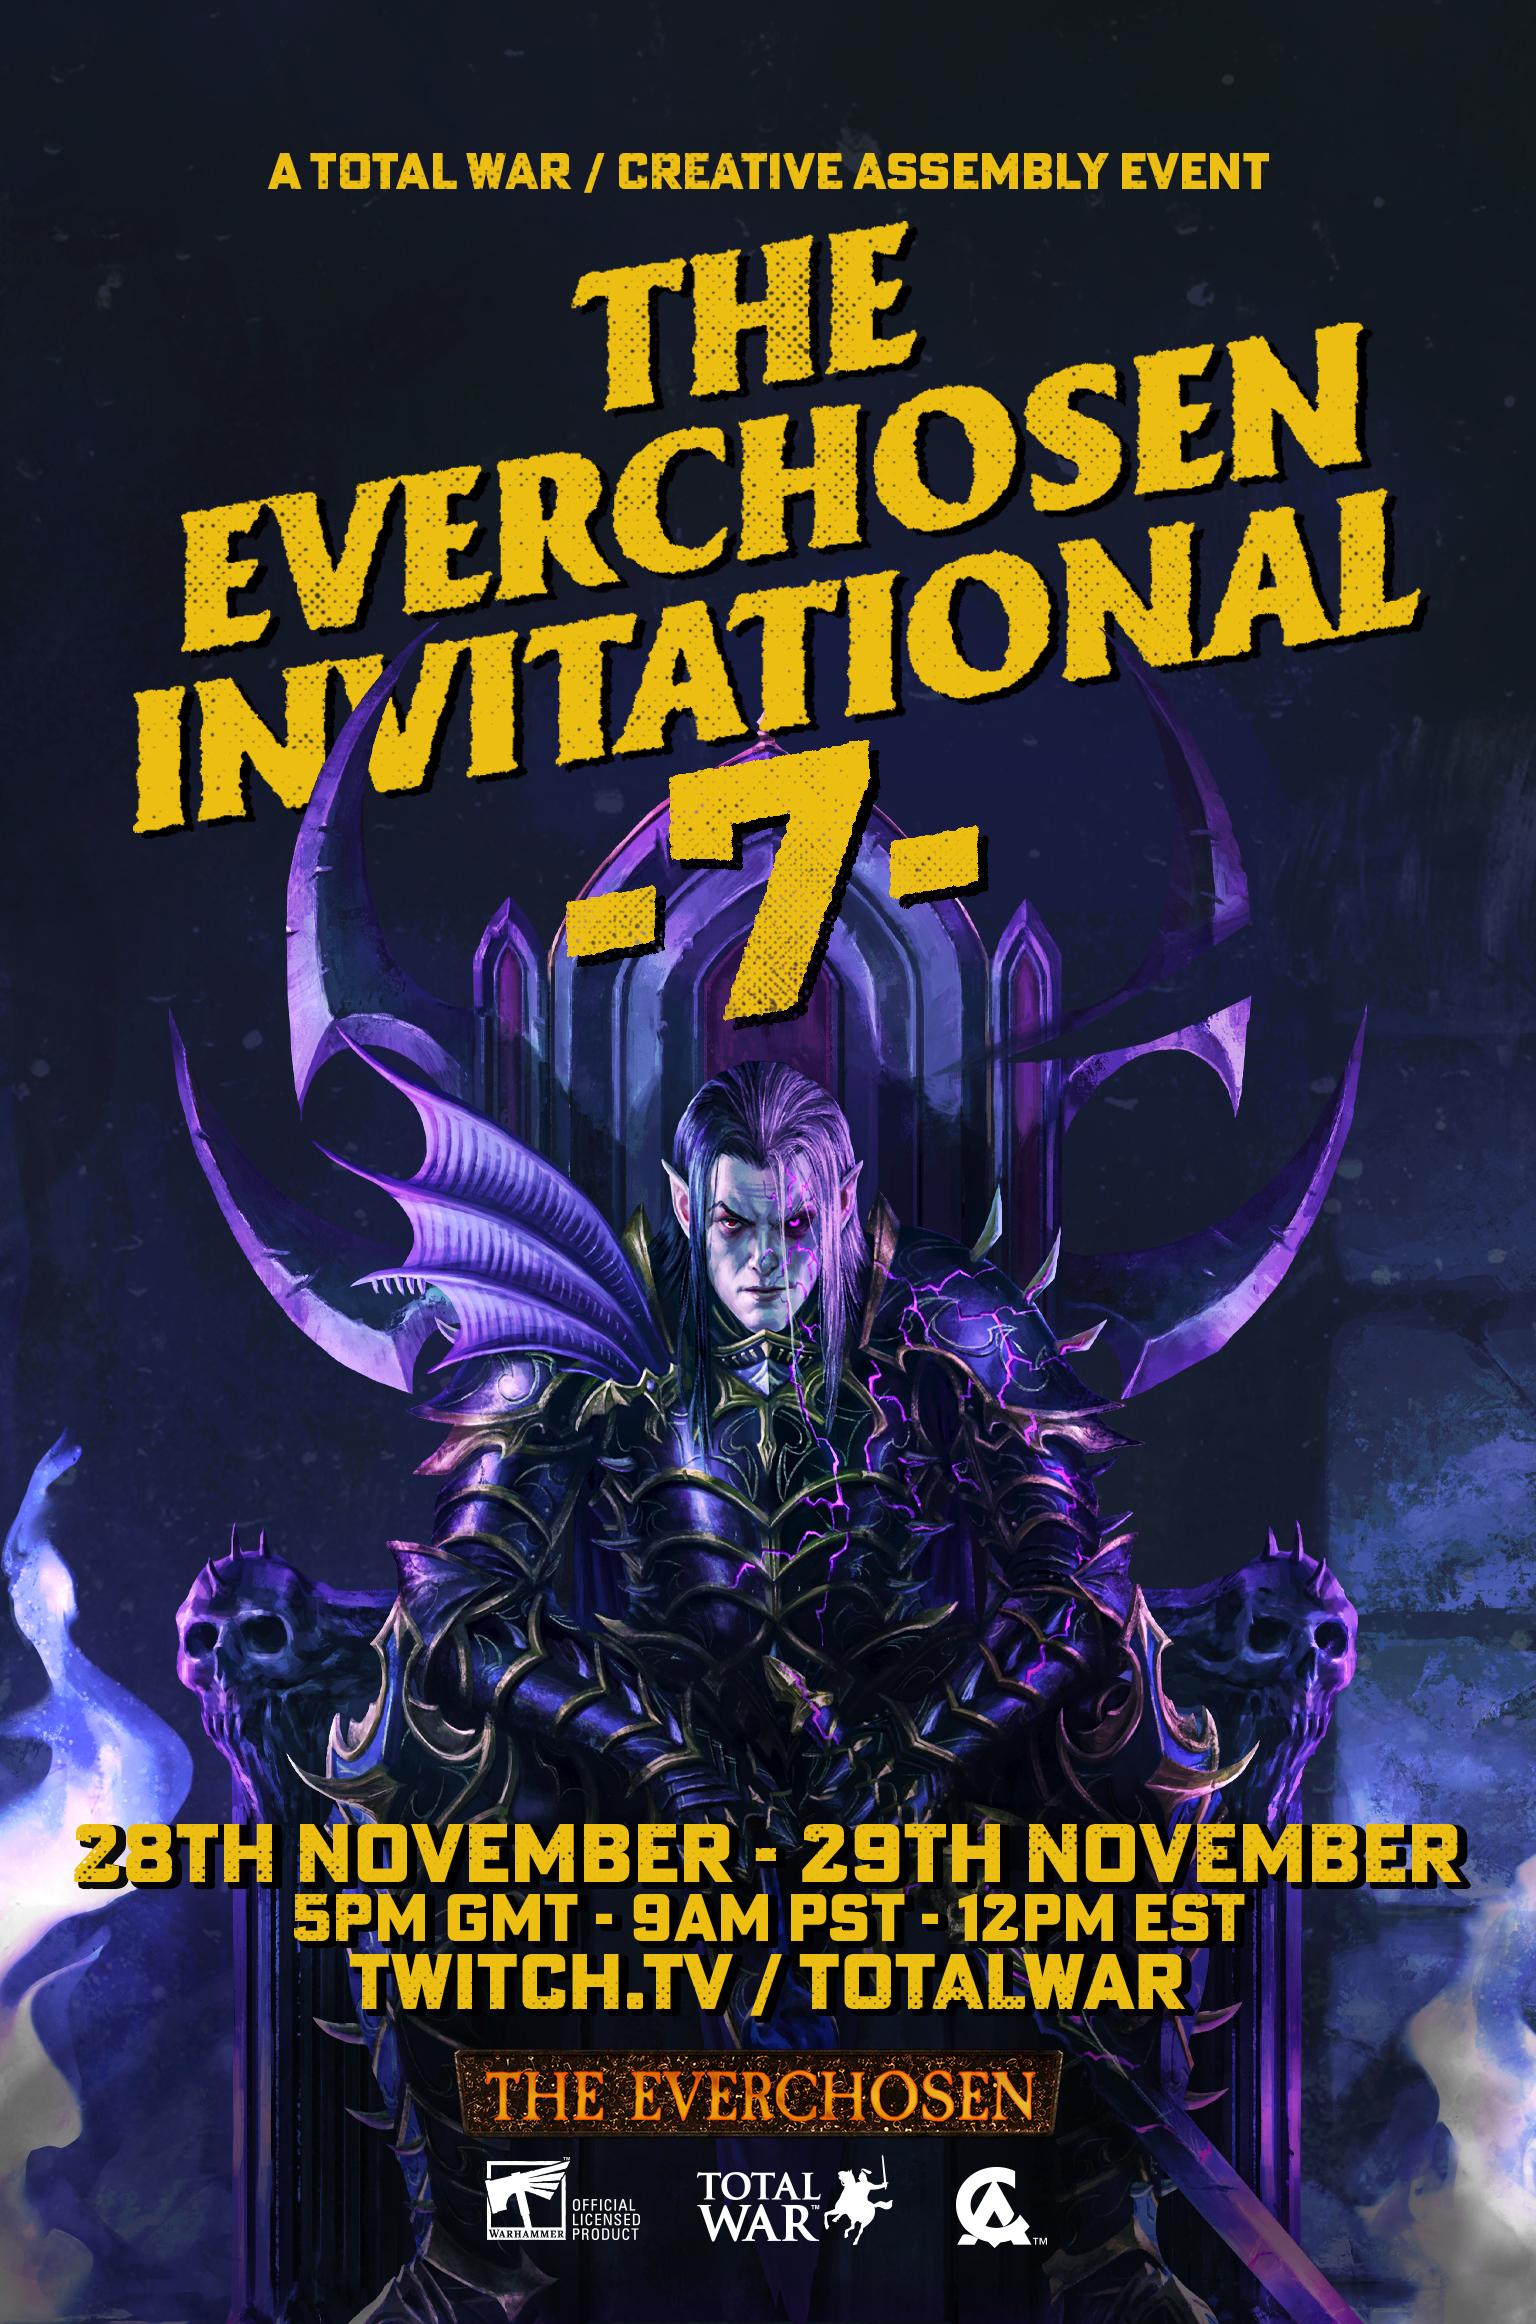 Announcing The Everchosen Invitational 7!